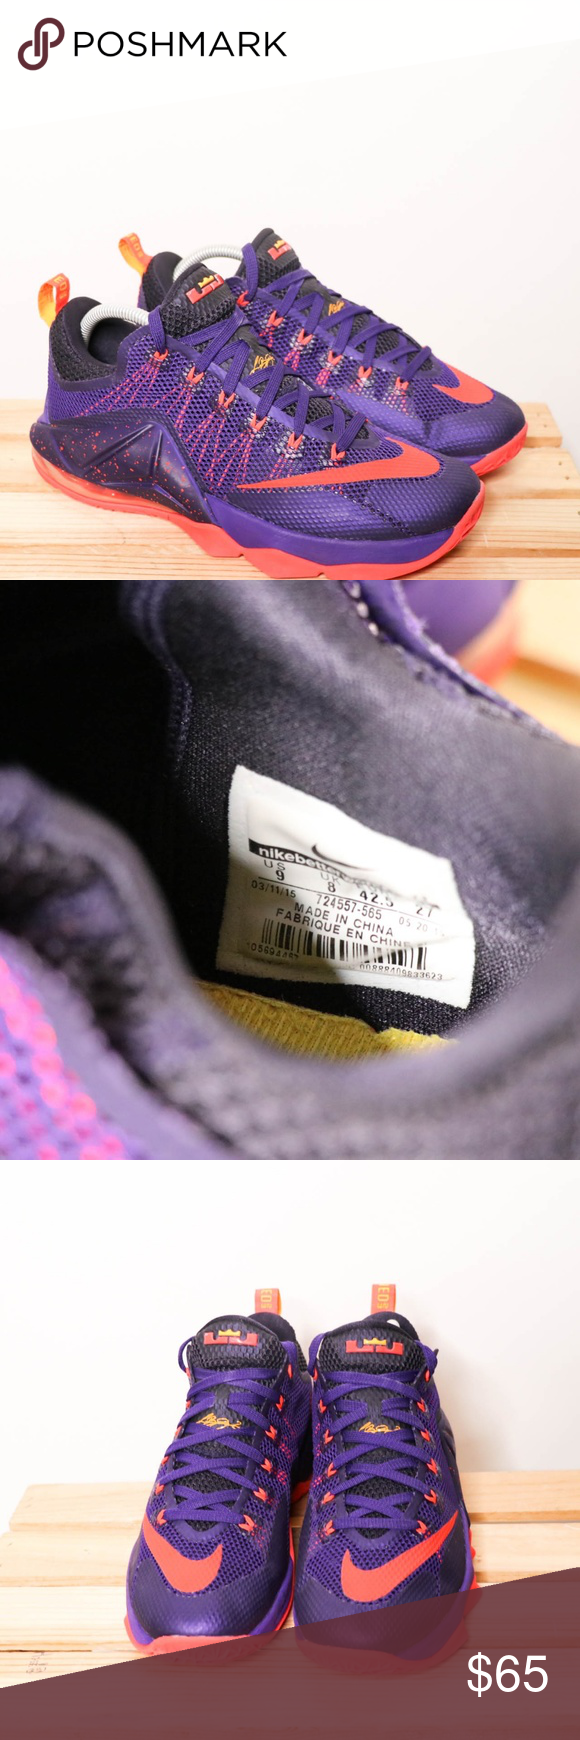 1154a169494 Nike Lebron XII Low Raptors Court Purple Bright Cr Gently used Nike Lebron  XII Low Raptors